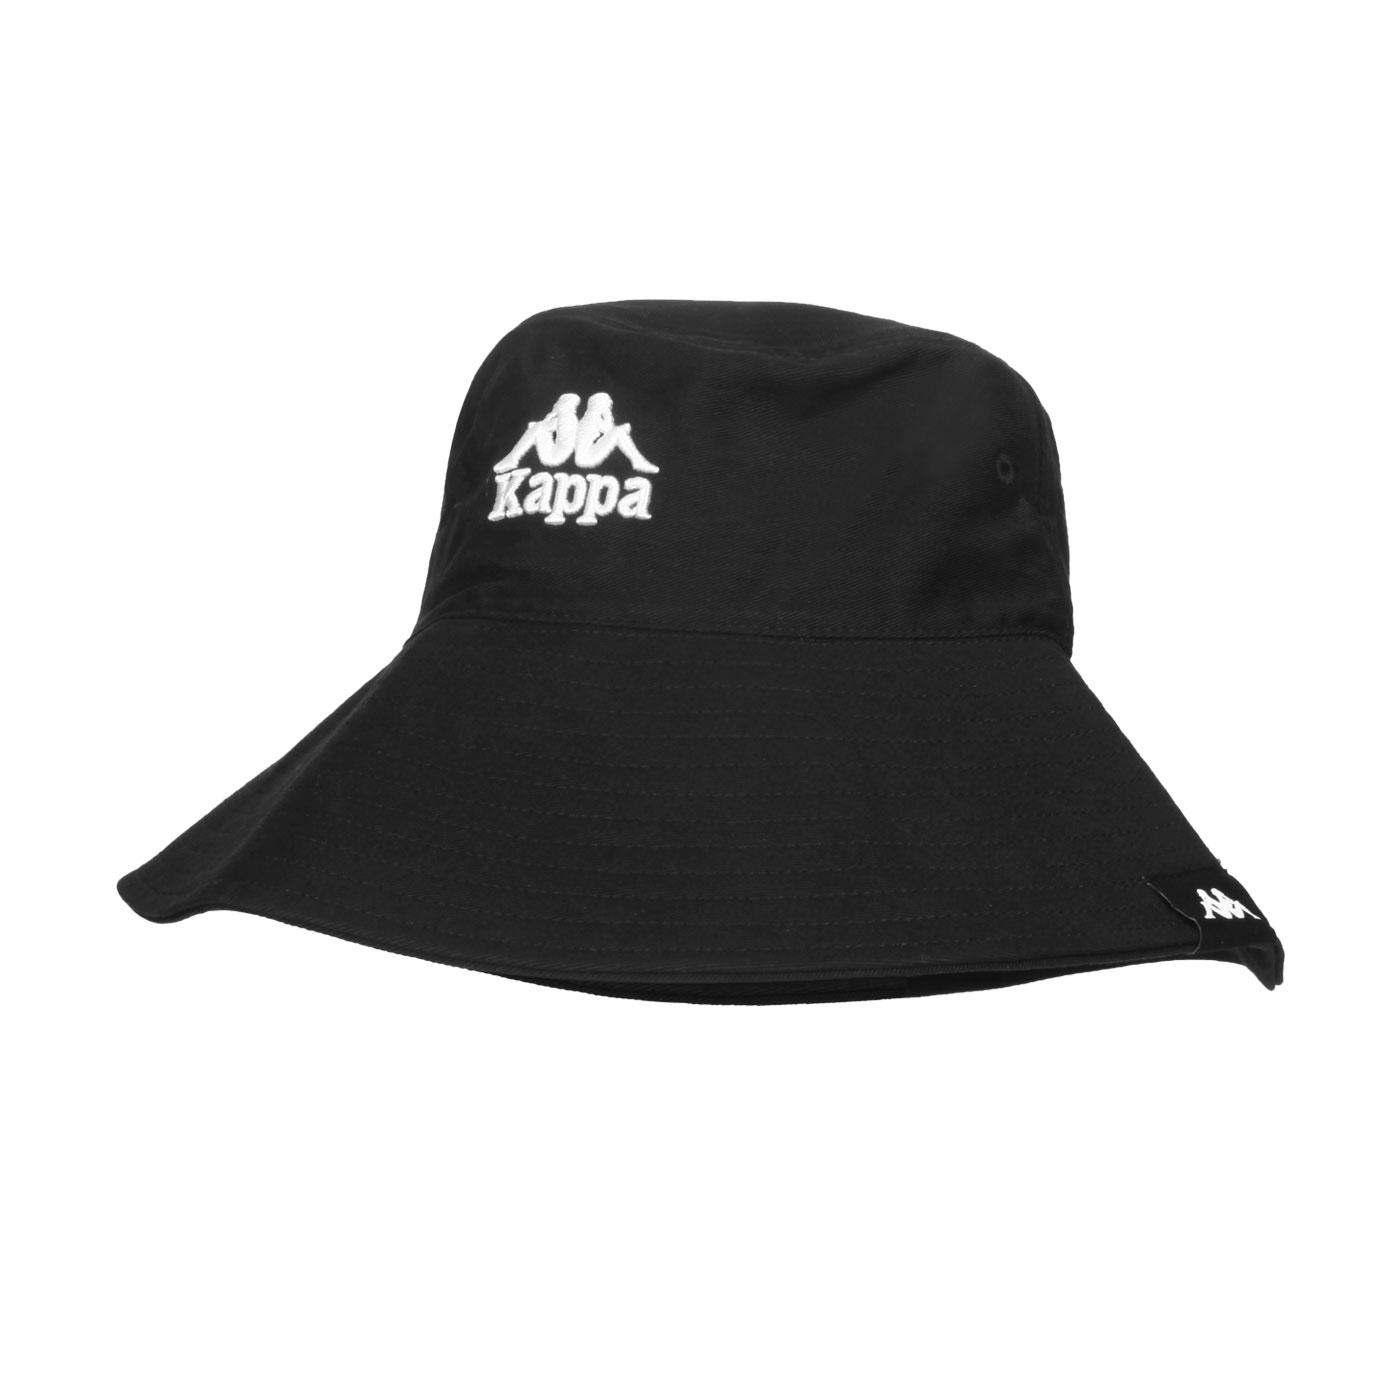 KAPPA 漁夫帽 32186JW-005 - 黑白